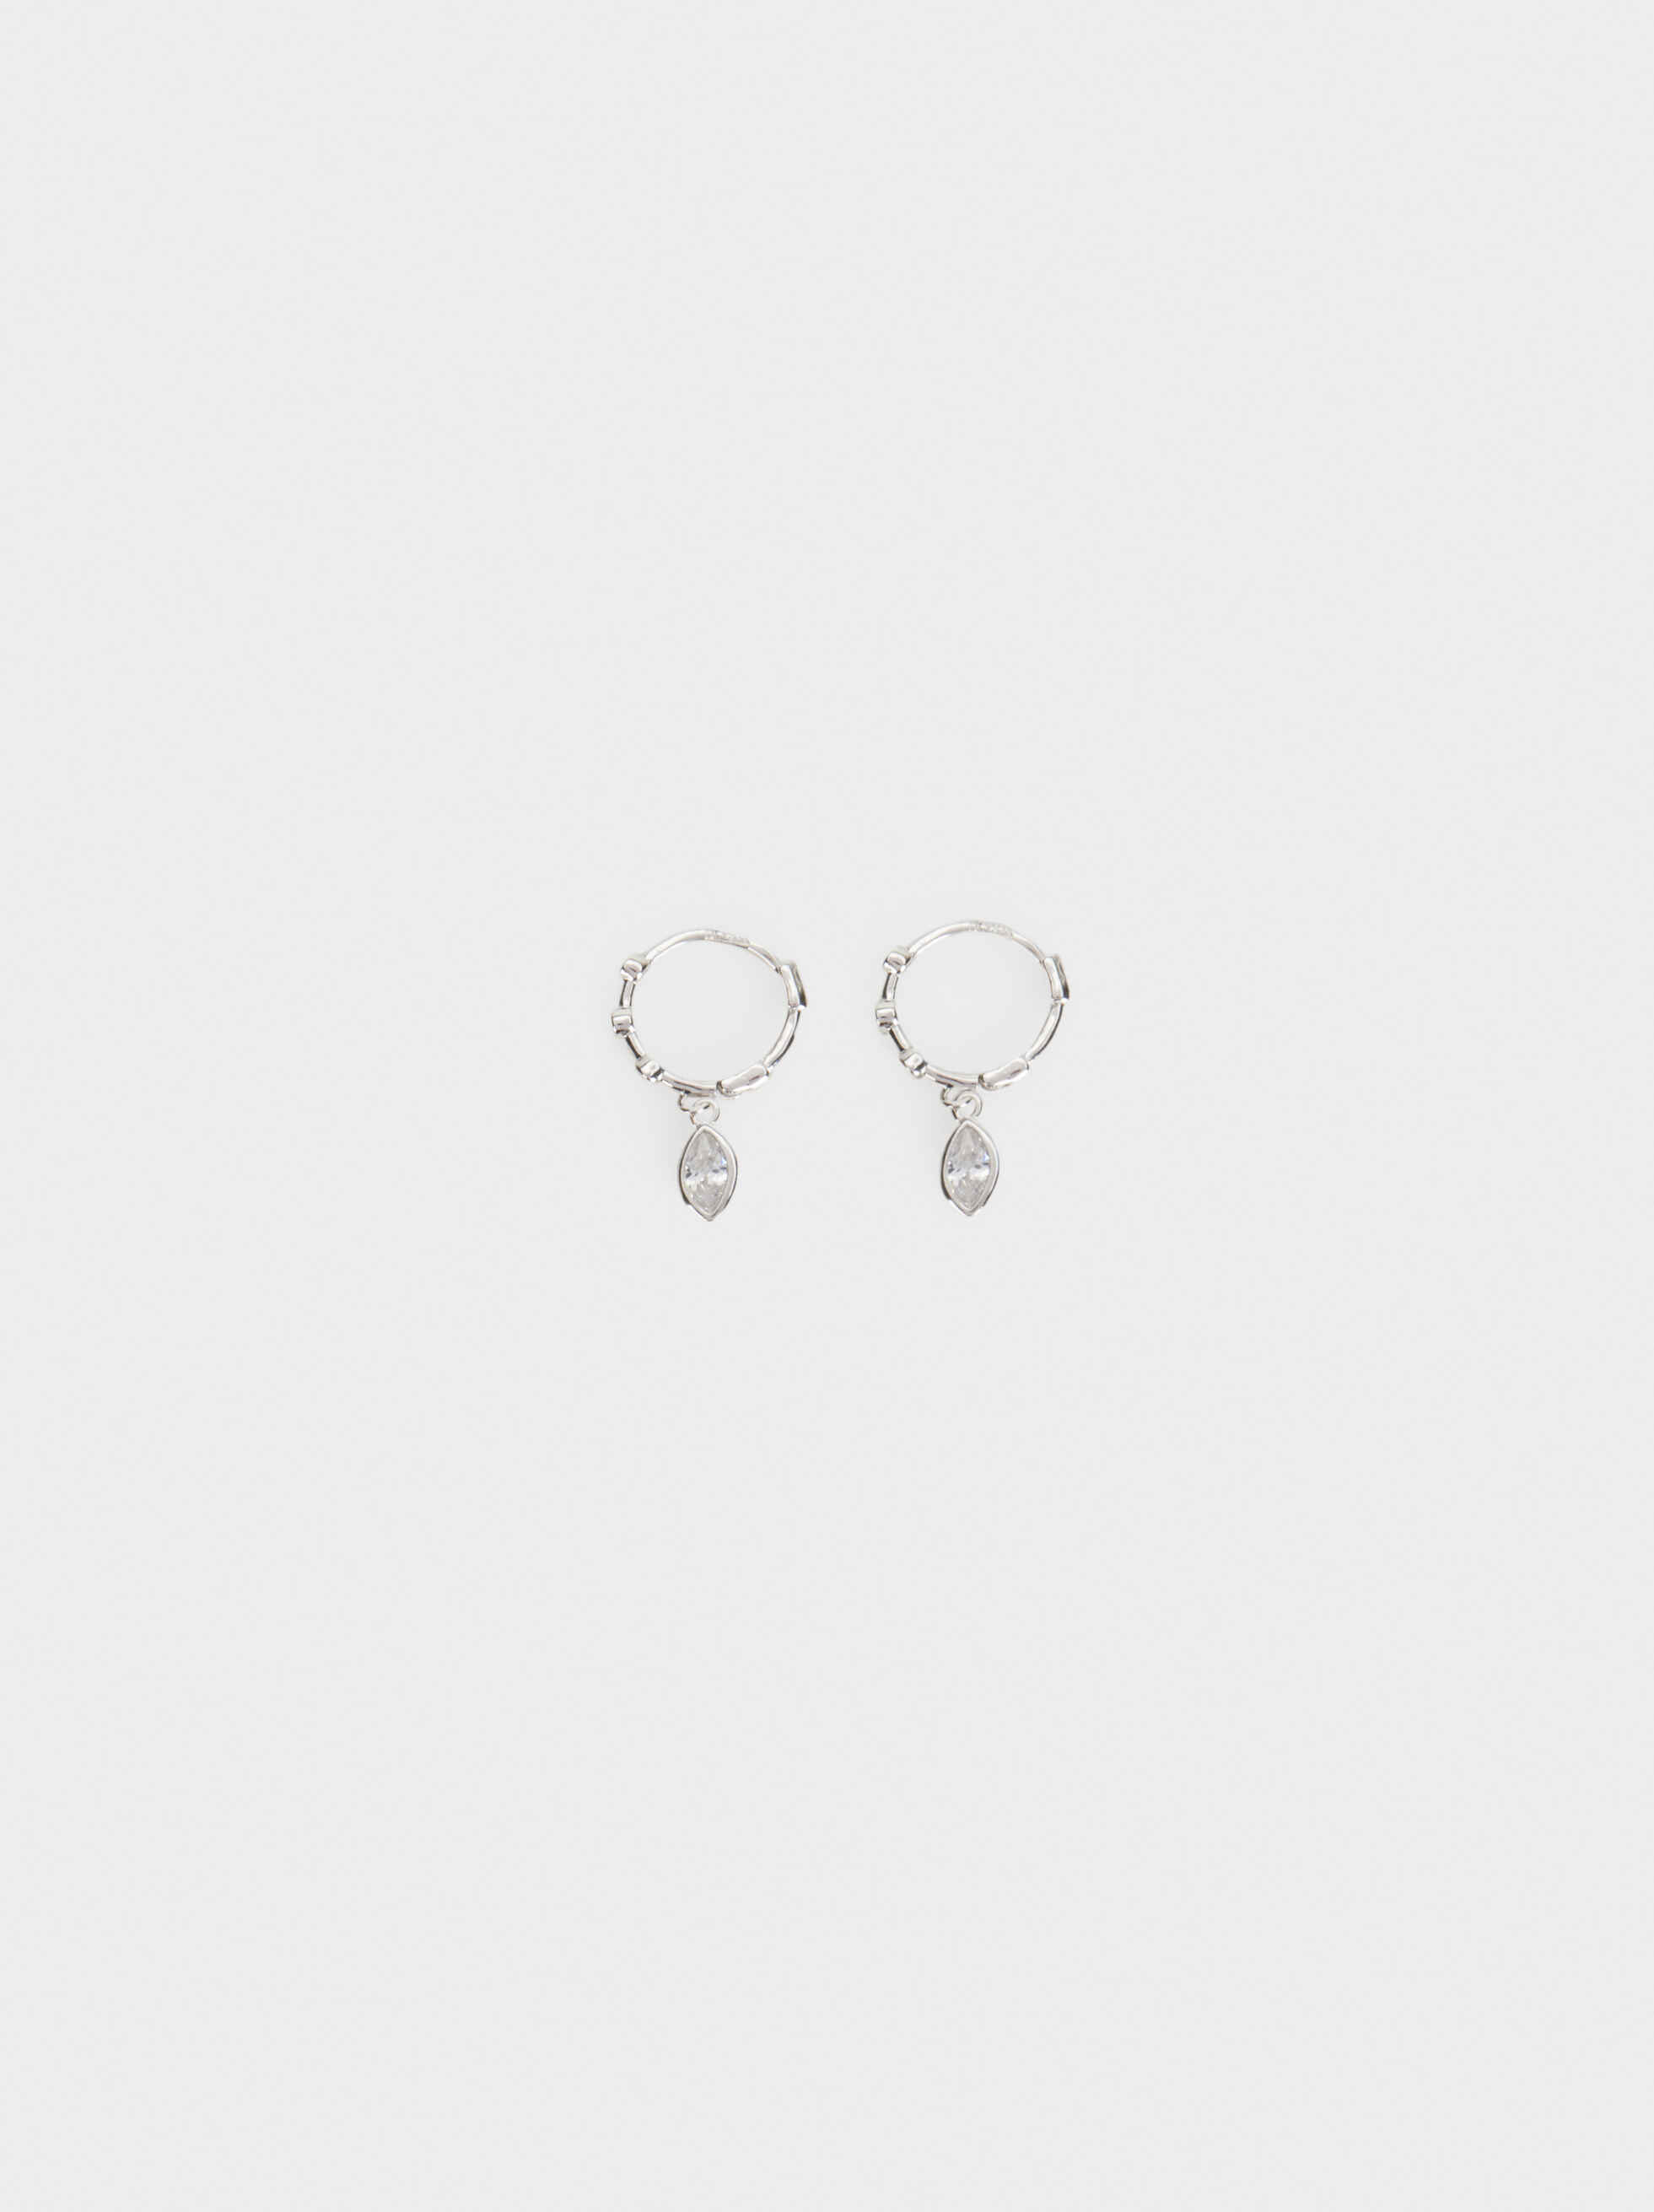 925 Silver Hoop Earrings With Pendant, Silver, hi-res